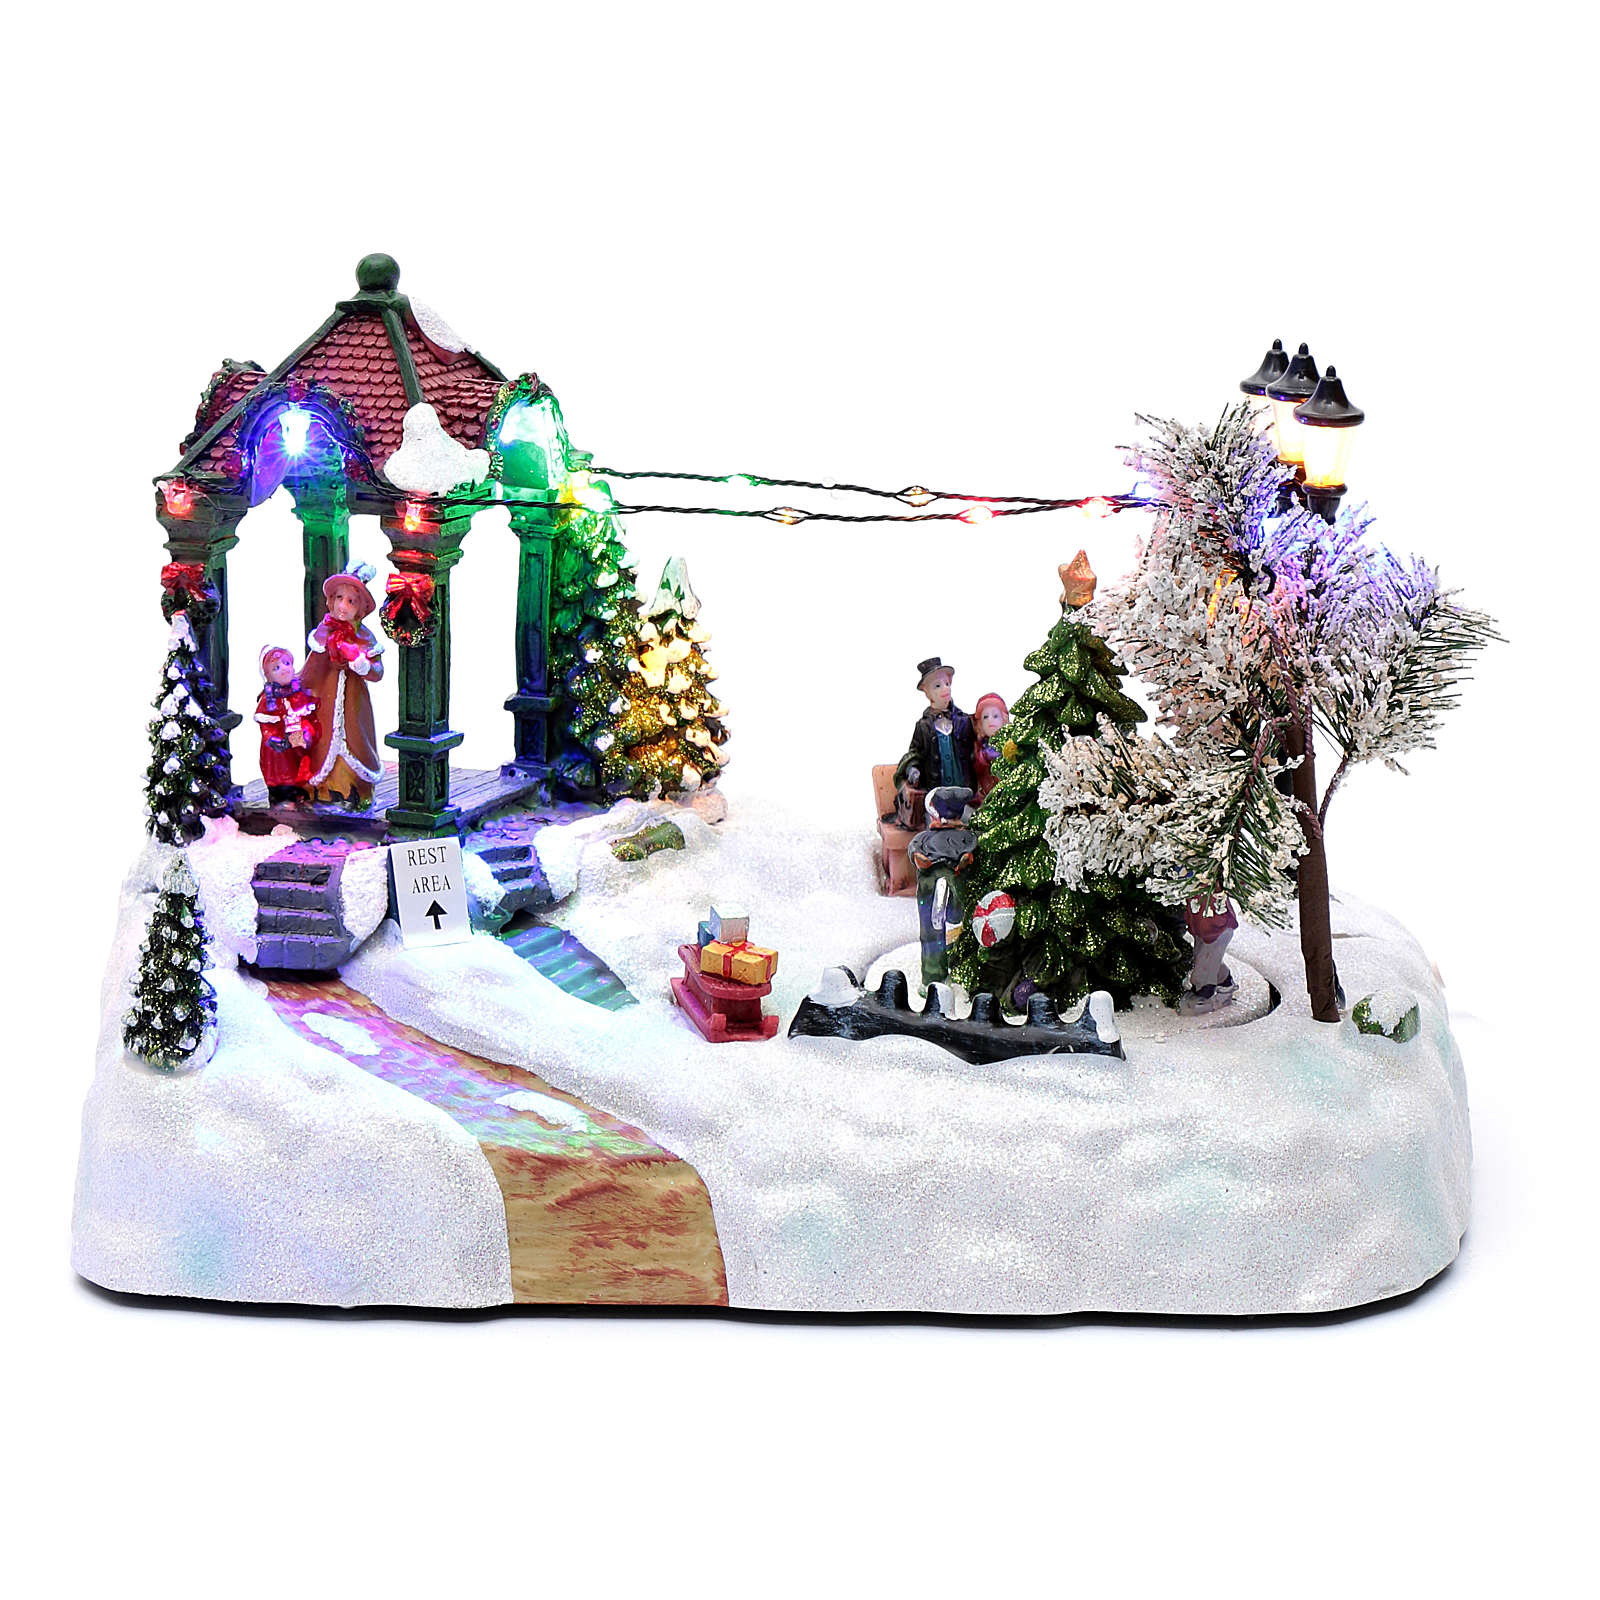 Paisaje navideño con movimiento, luces y música navideña 20x25x15 cm 3